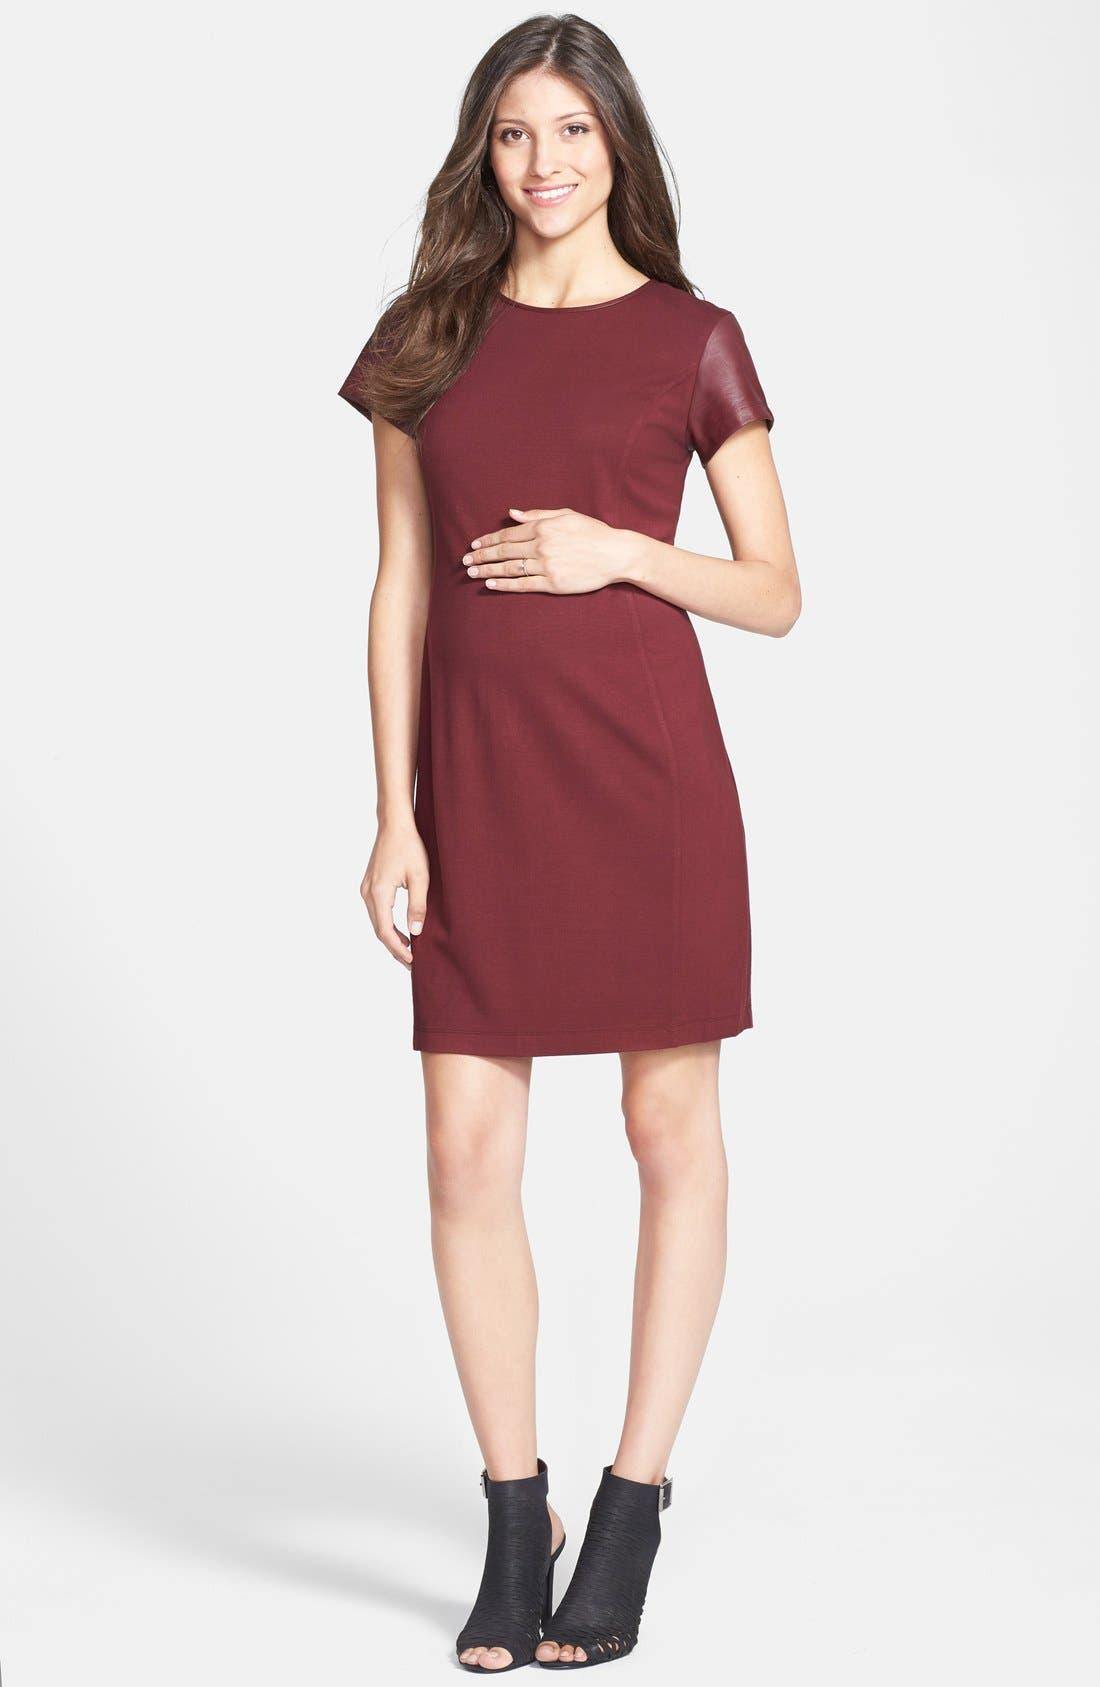 Main Image - Tart Maternity 'Braidy' Faux Leather Sleeve Maternity Dress